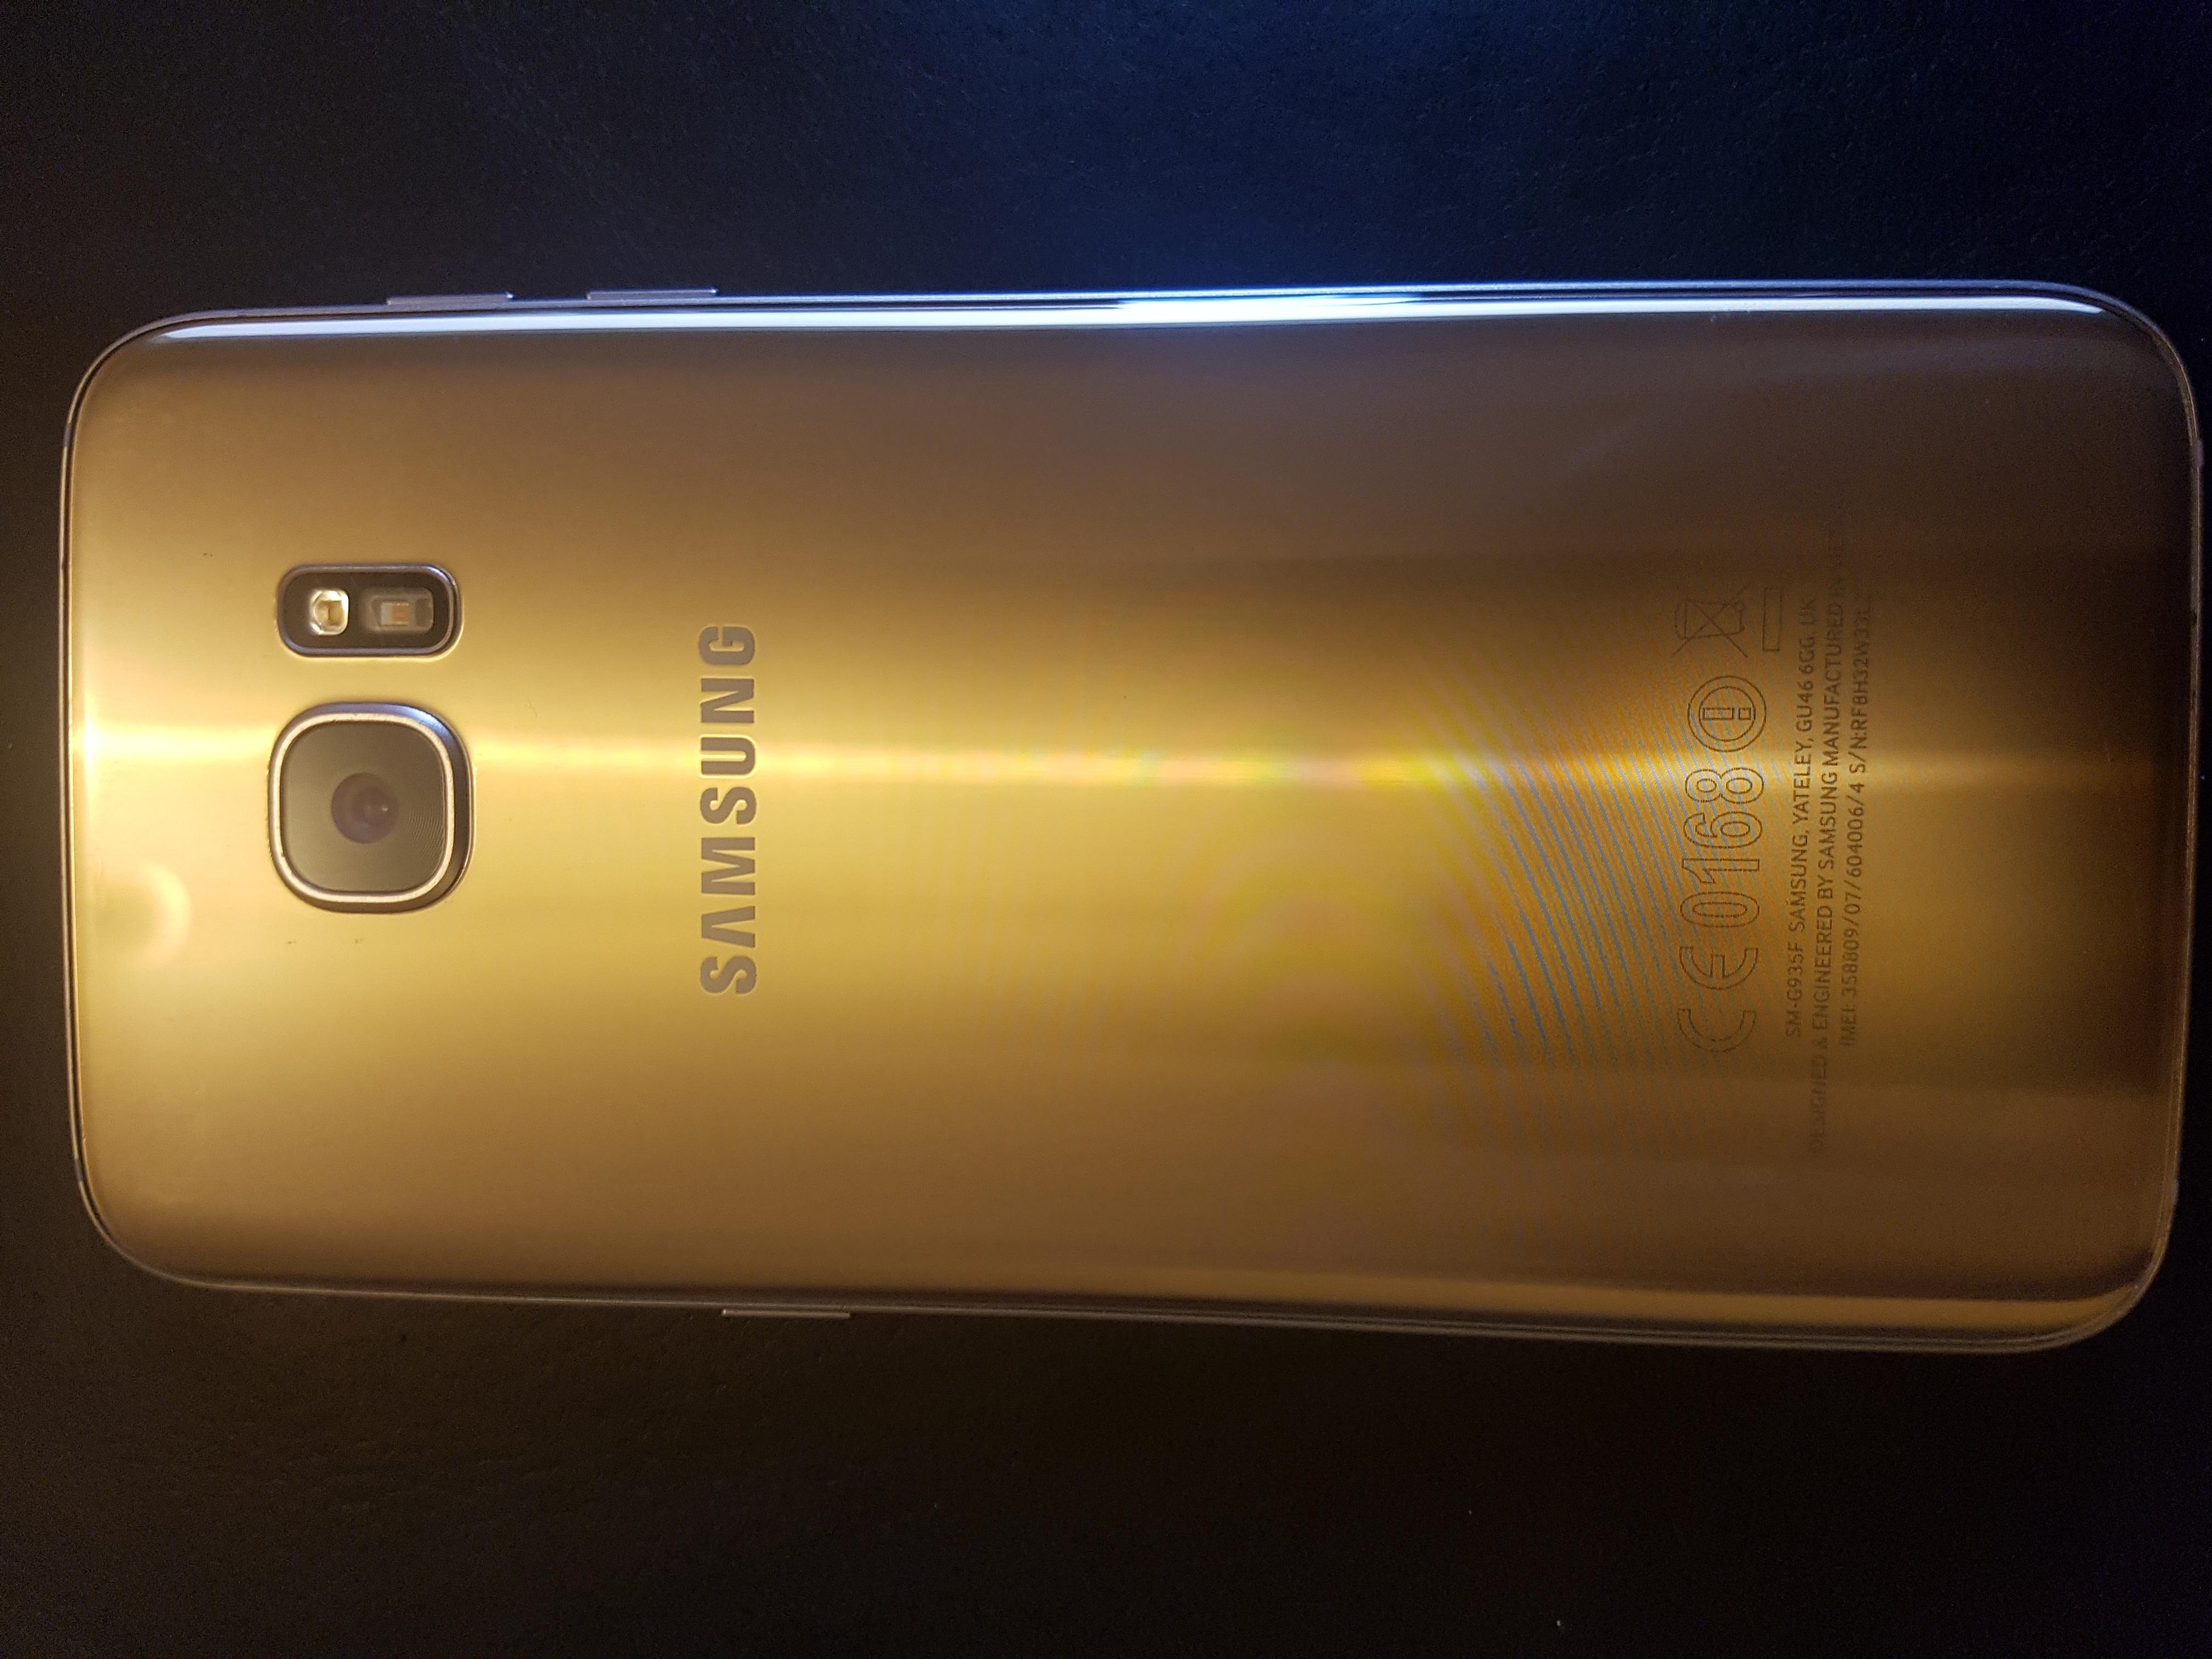 Samsung galaxy s7 edge perfect condition